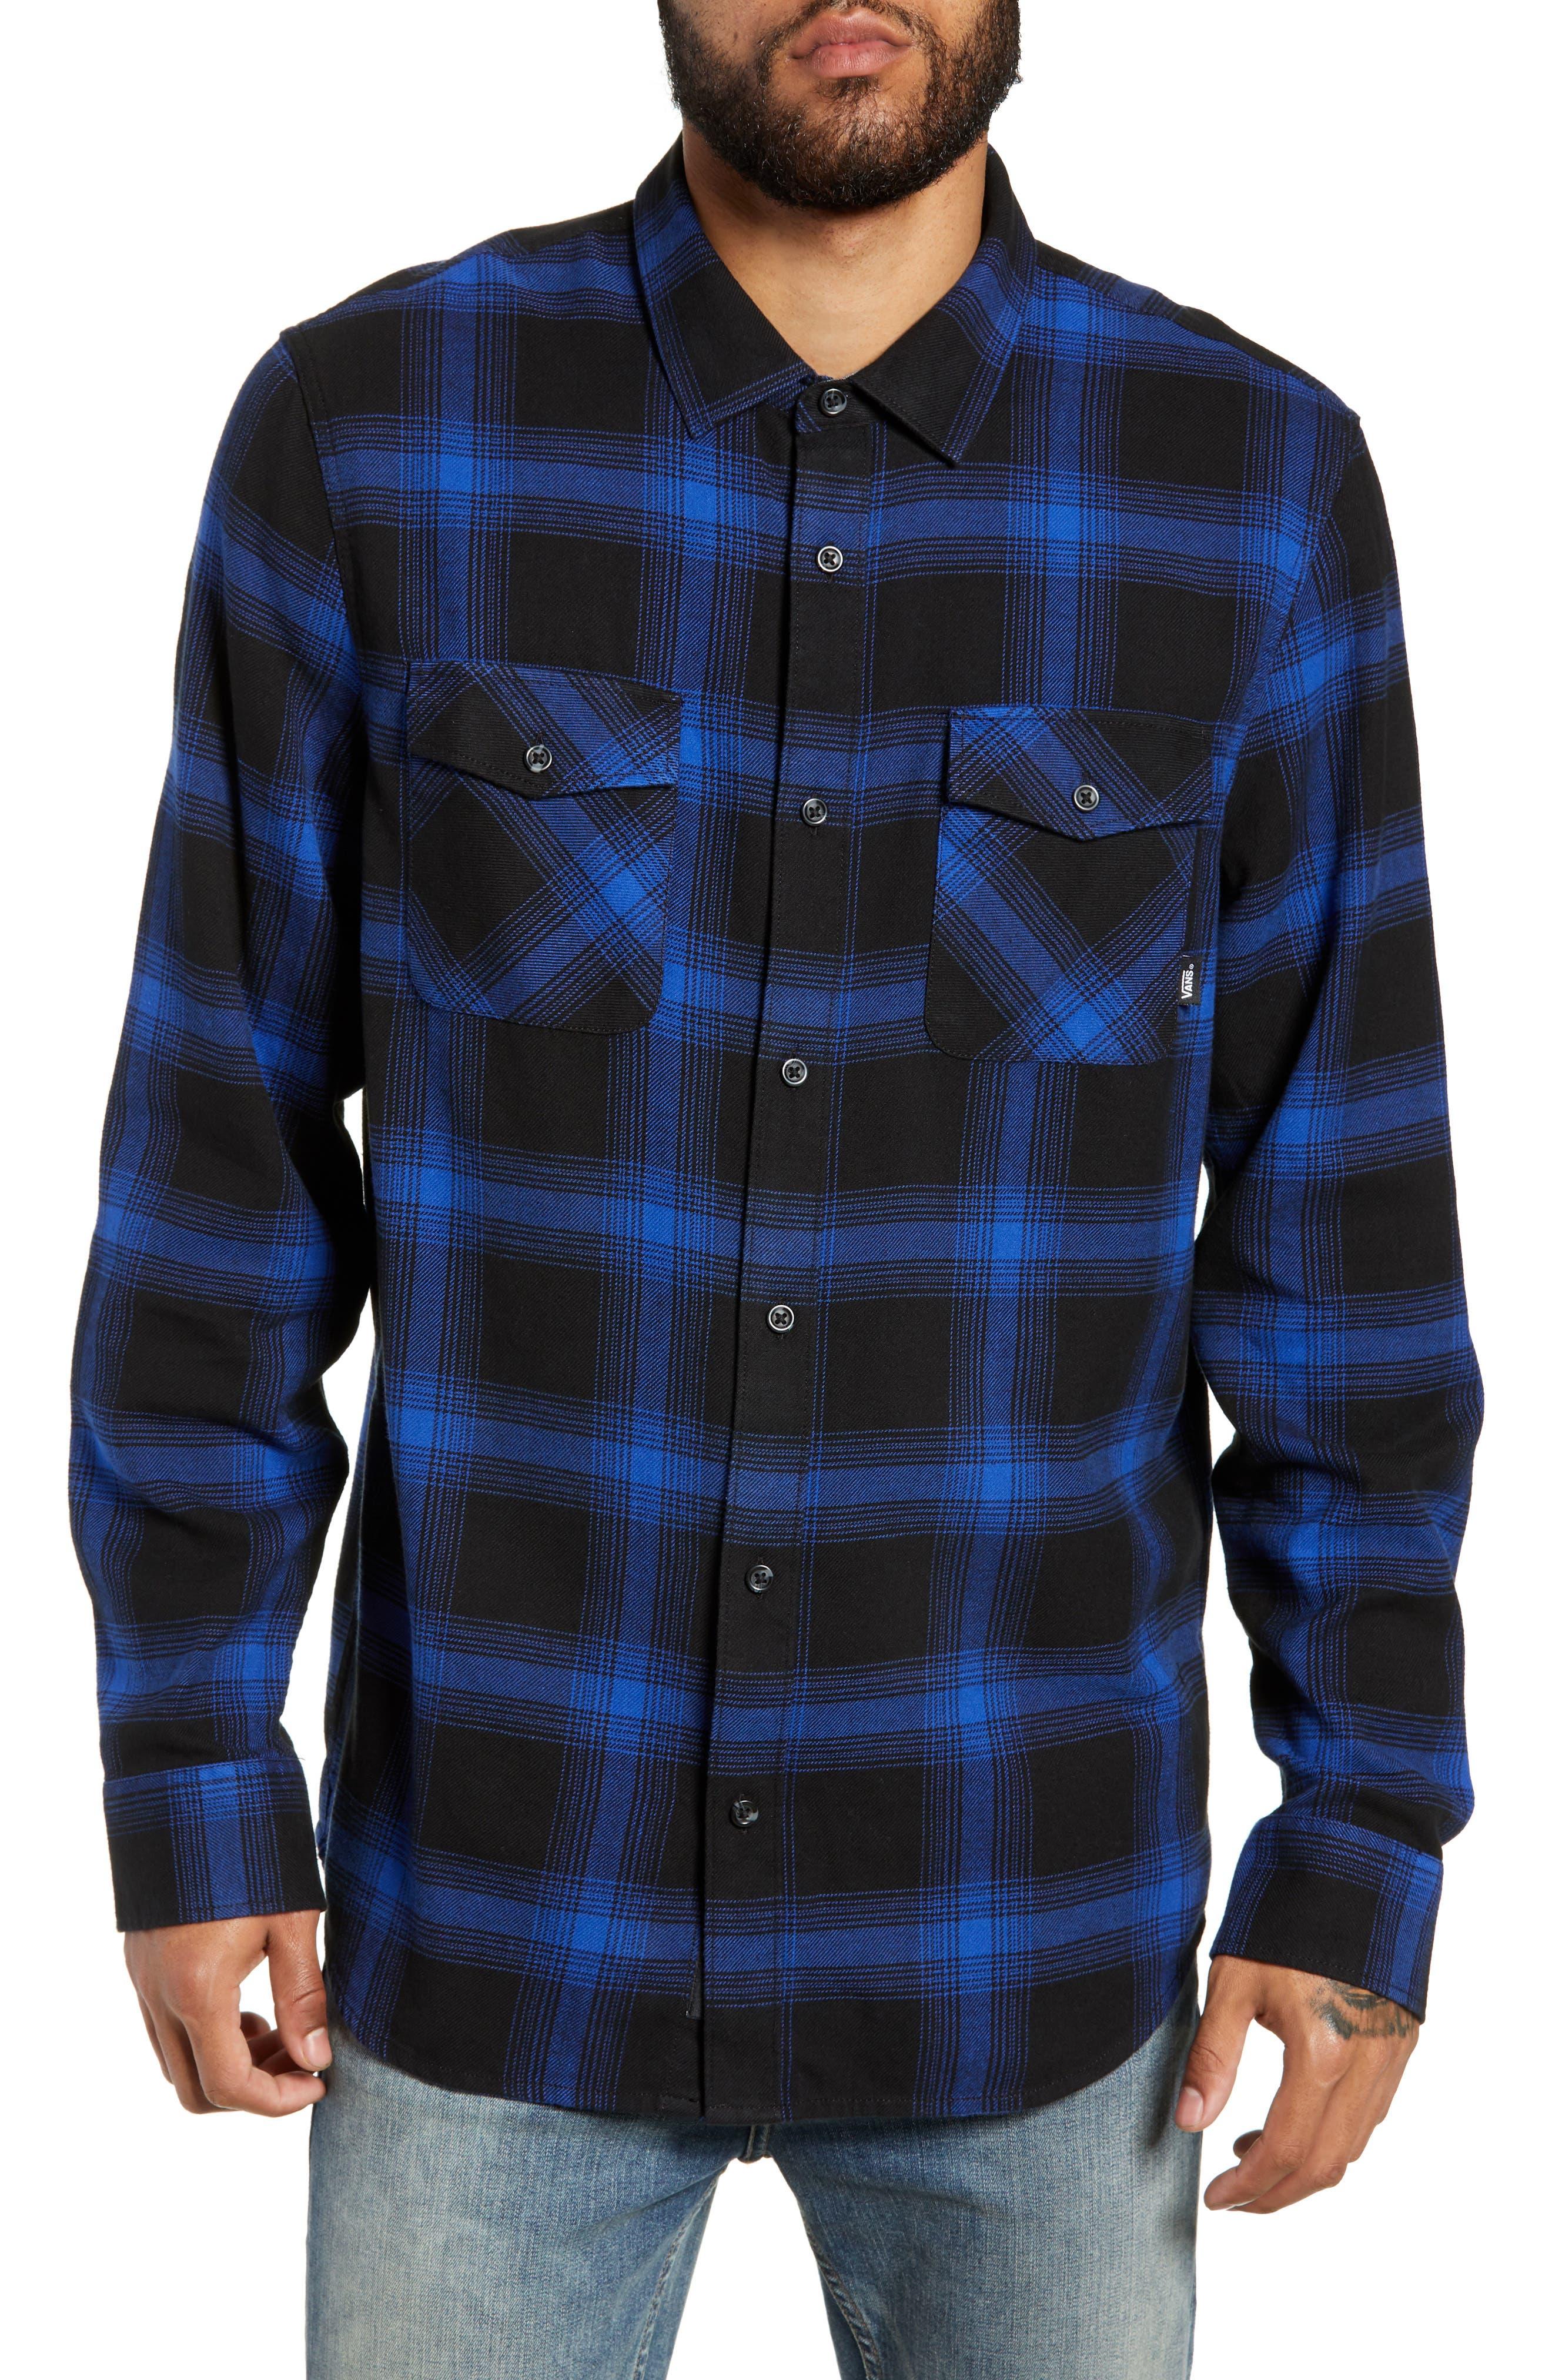 Vans Monterey Iii Plaid Flannel Shirt, Black